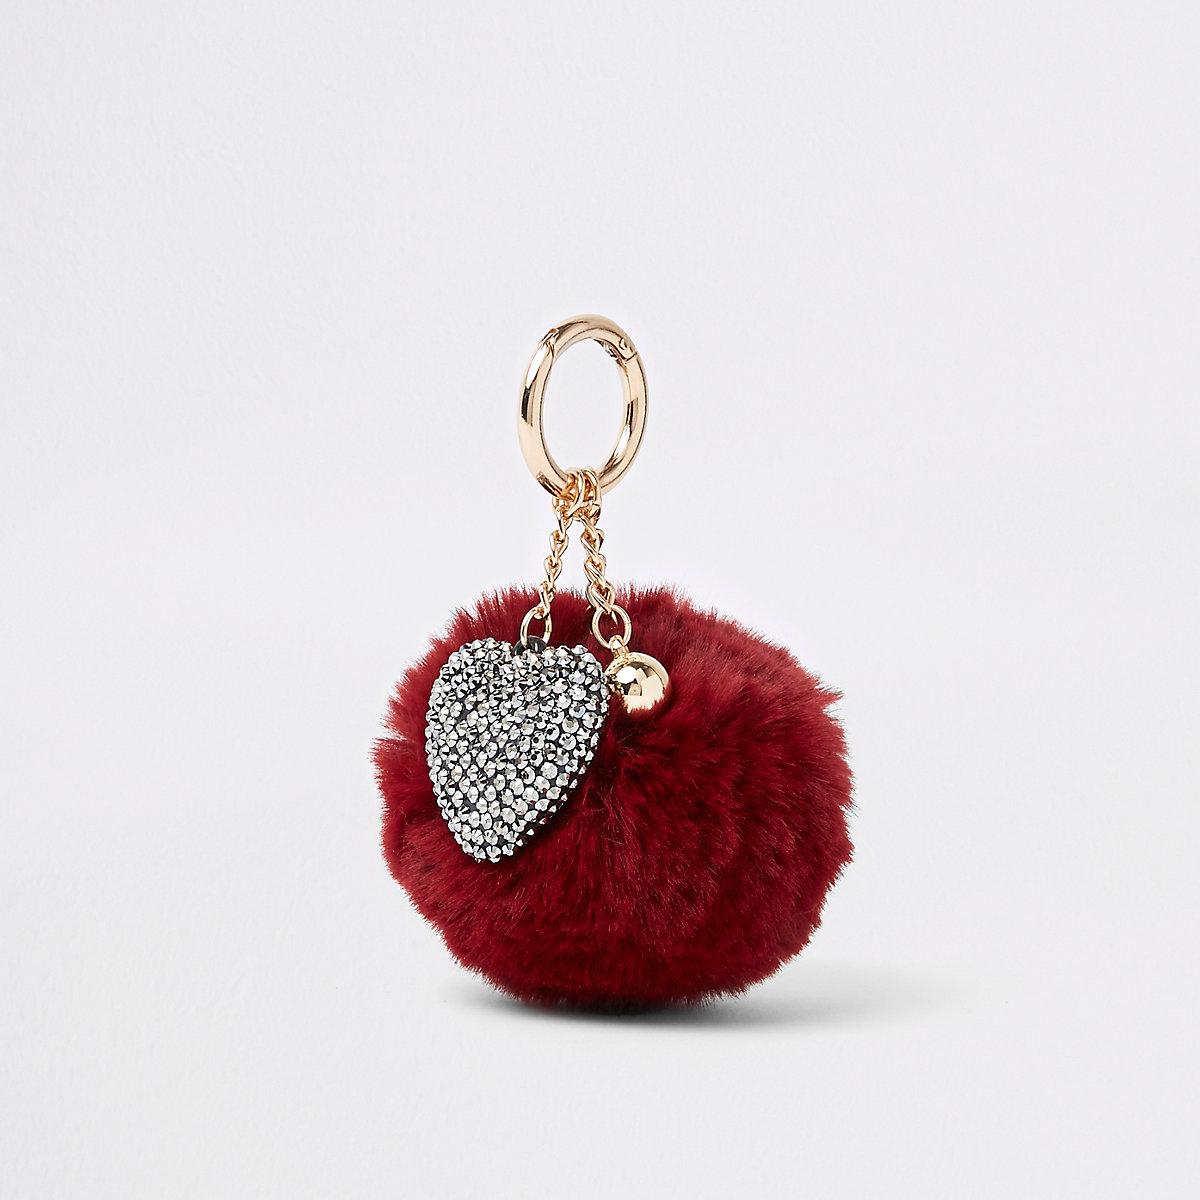 Dark red faux fur pom pom heart charm keyring